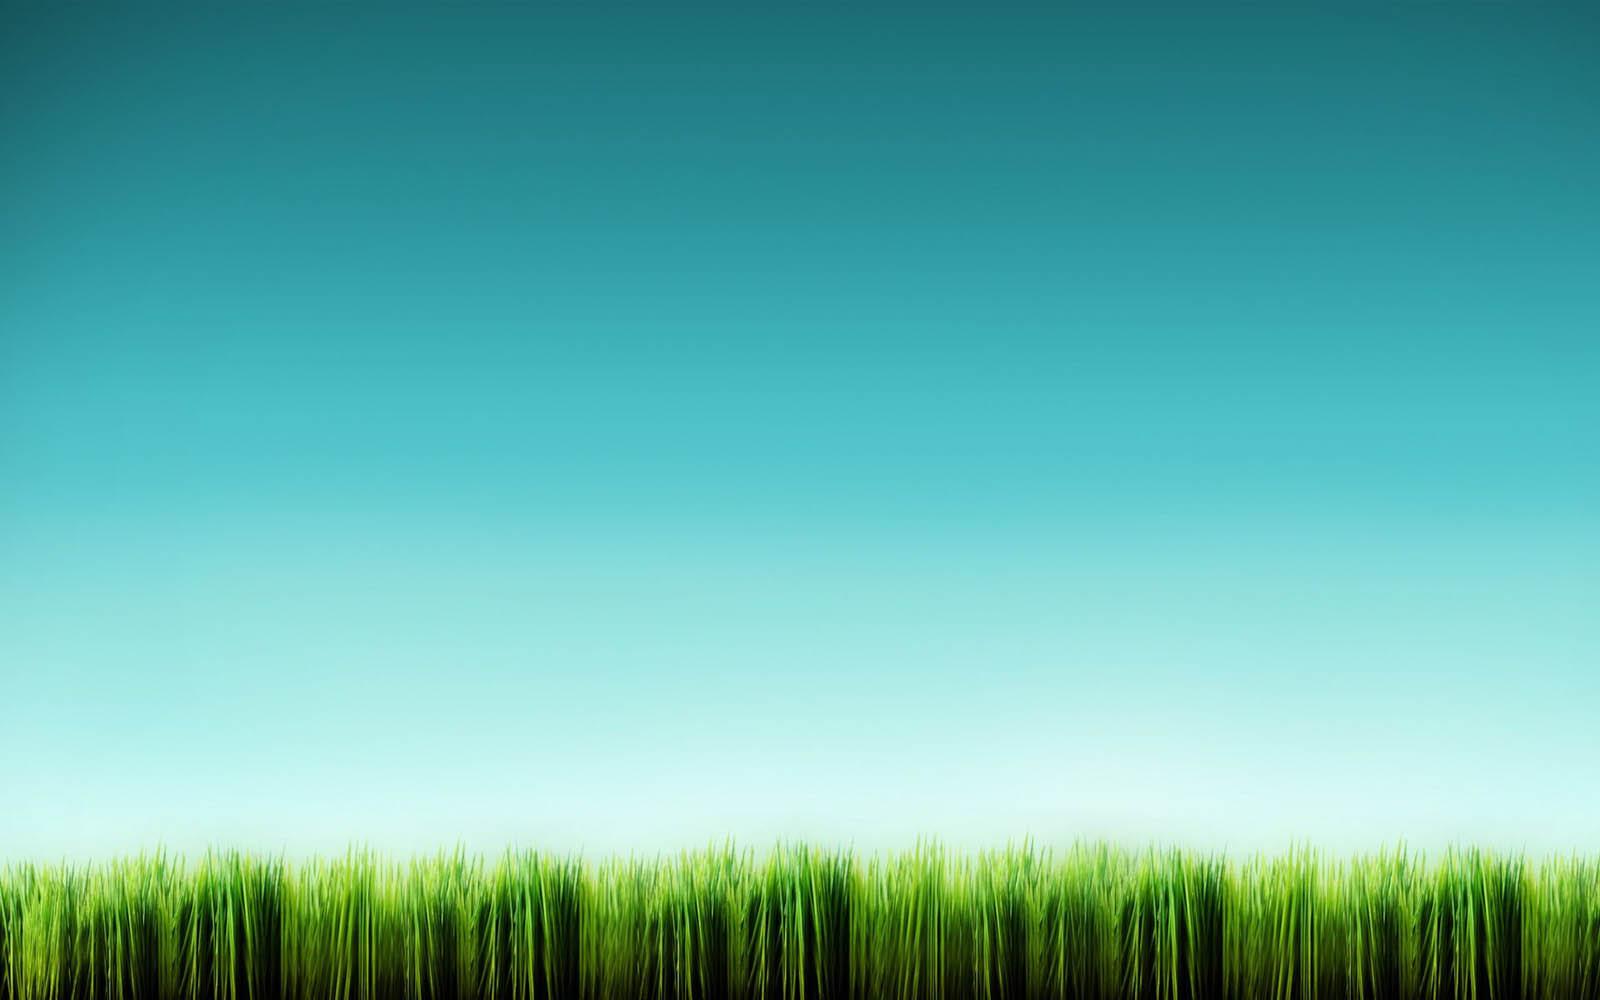 Wallpapers  Tall Grass Wallpapers